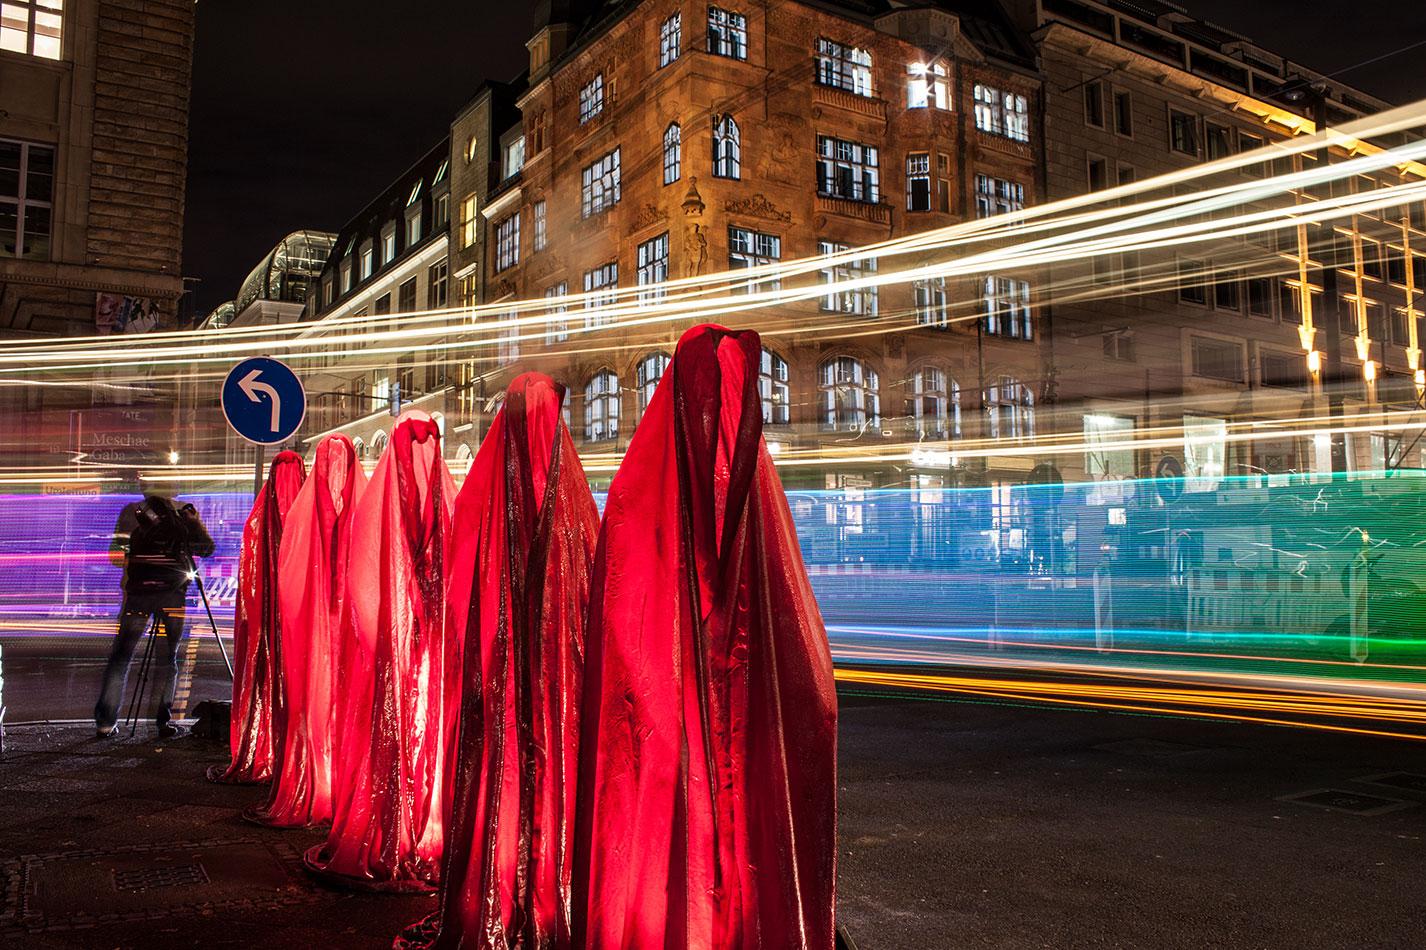 festival-of-lights-berlin-microsoft-light-art-show-exhibition-lumina-guardians-of-time-manfred-kili-kielnhofer-contemporary-arts-design-sculpture-3470